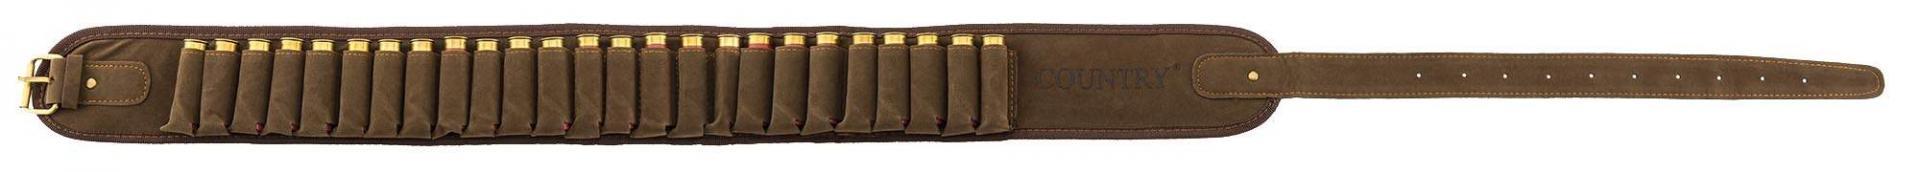 Cartouchie re country sellerie aspect velours avec calibre 12